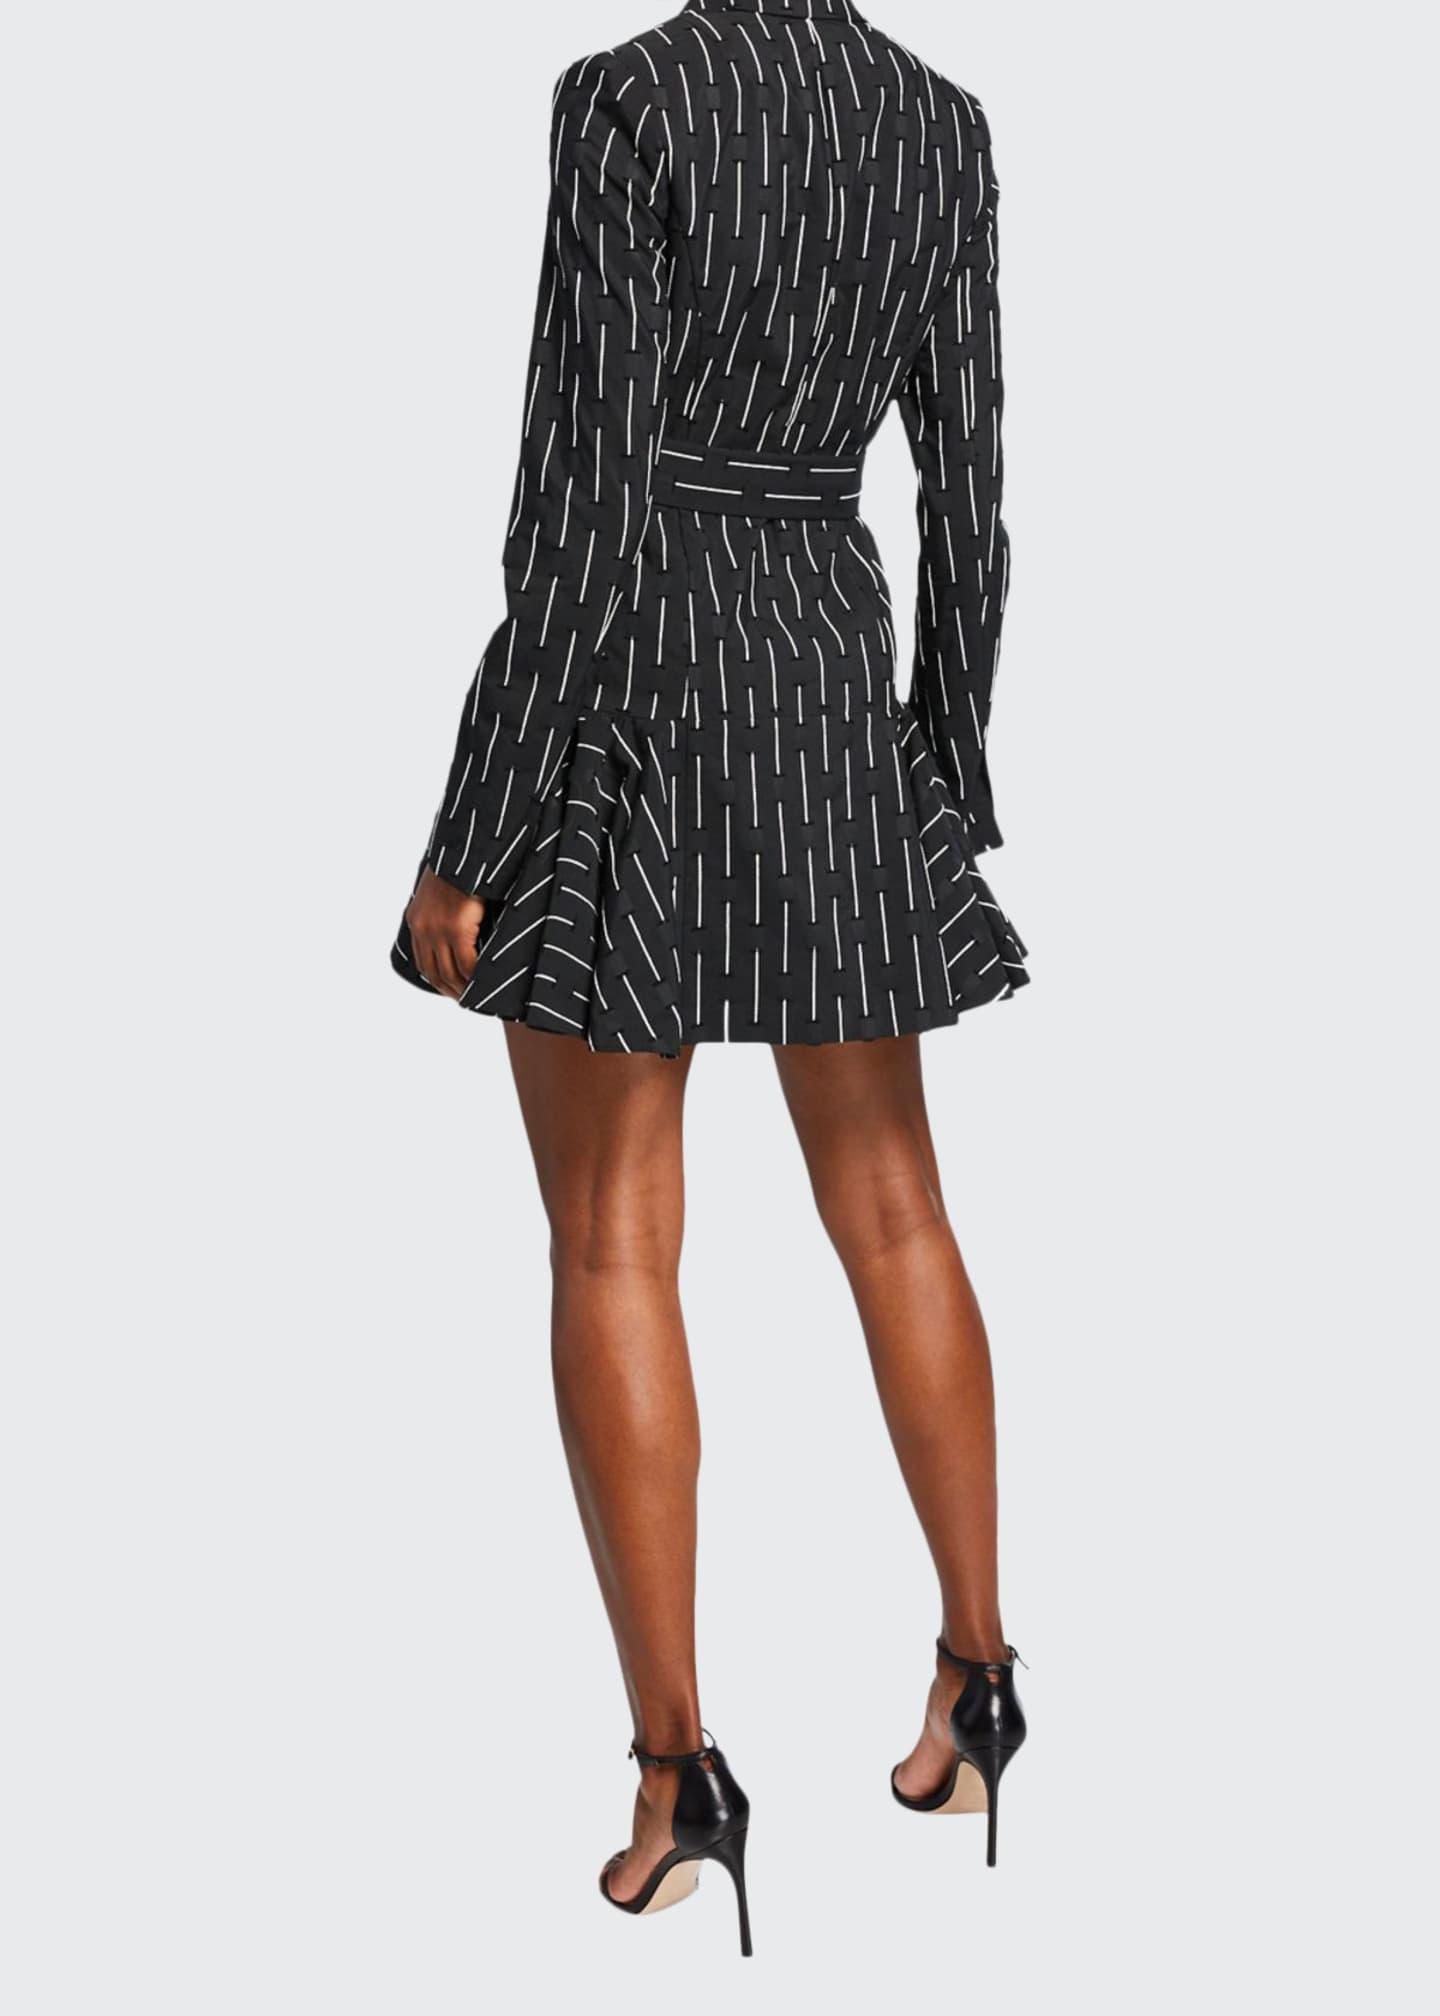 Alexis Kaedan Striped A-Line Belted Mini Dress